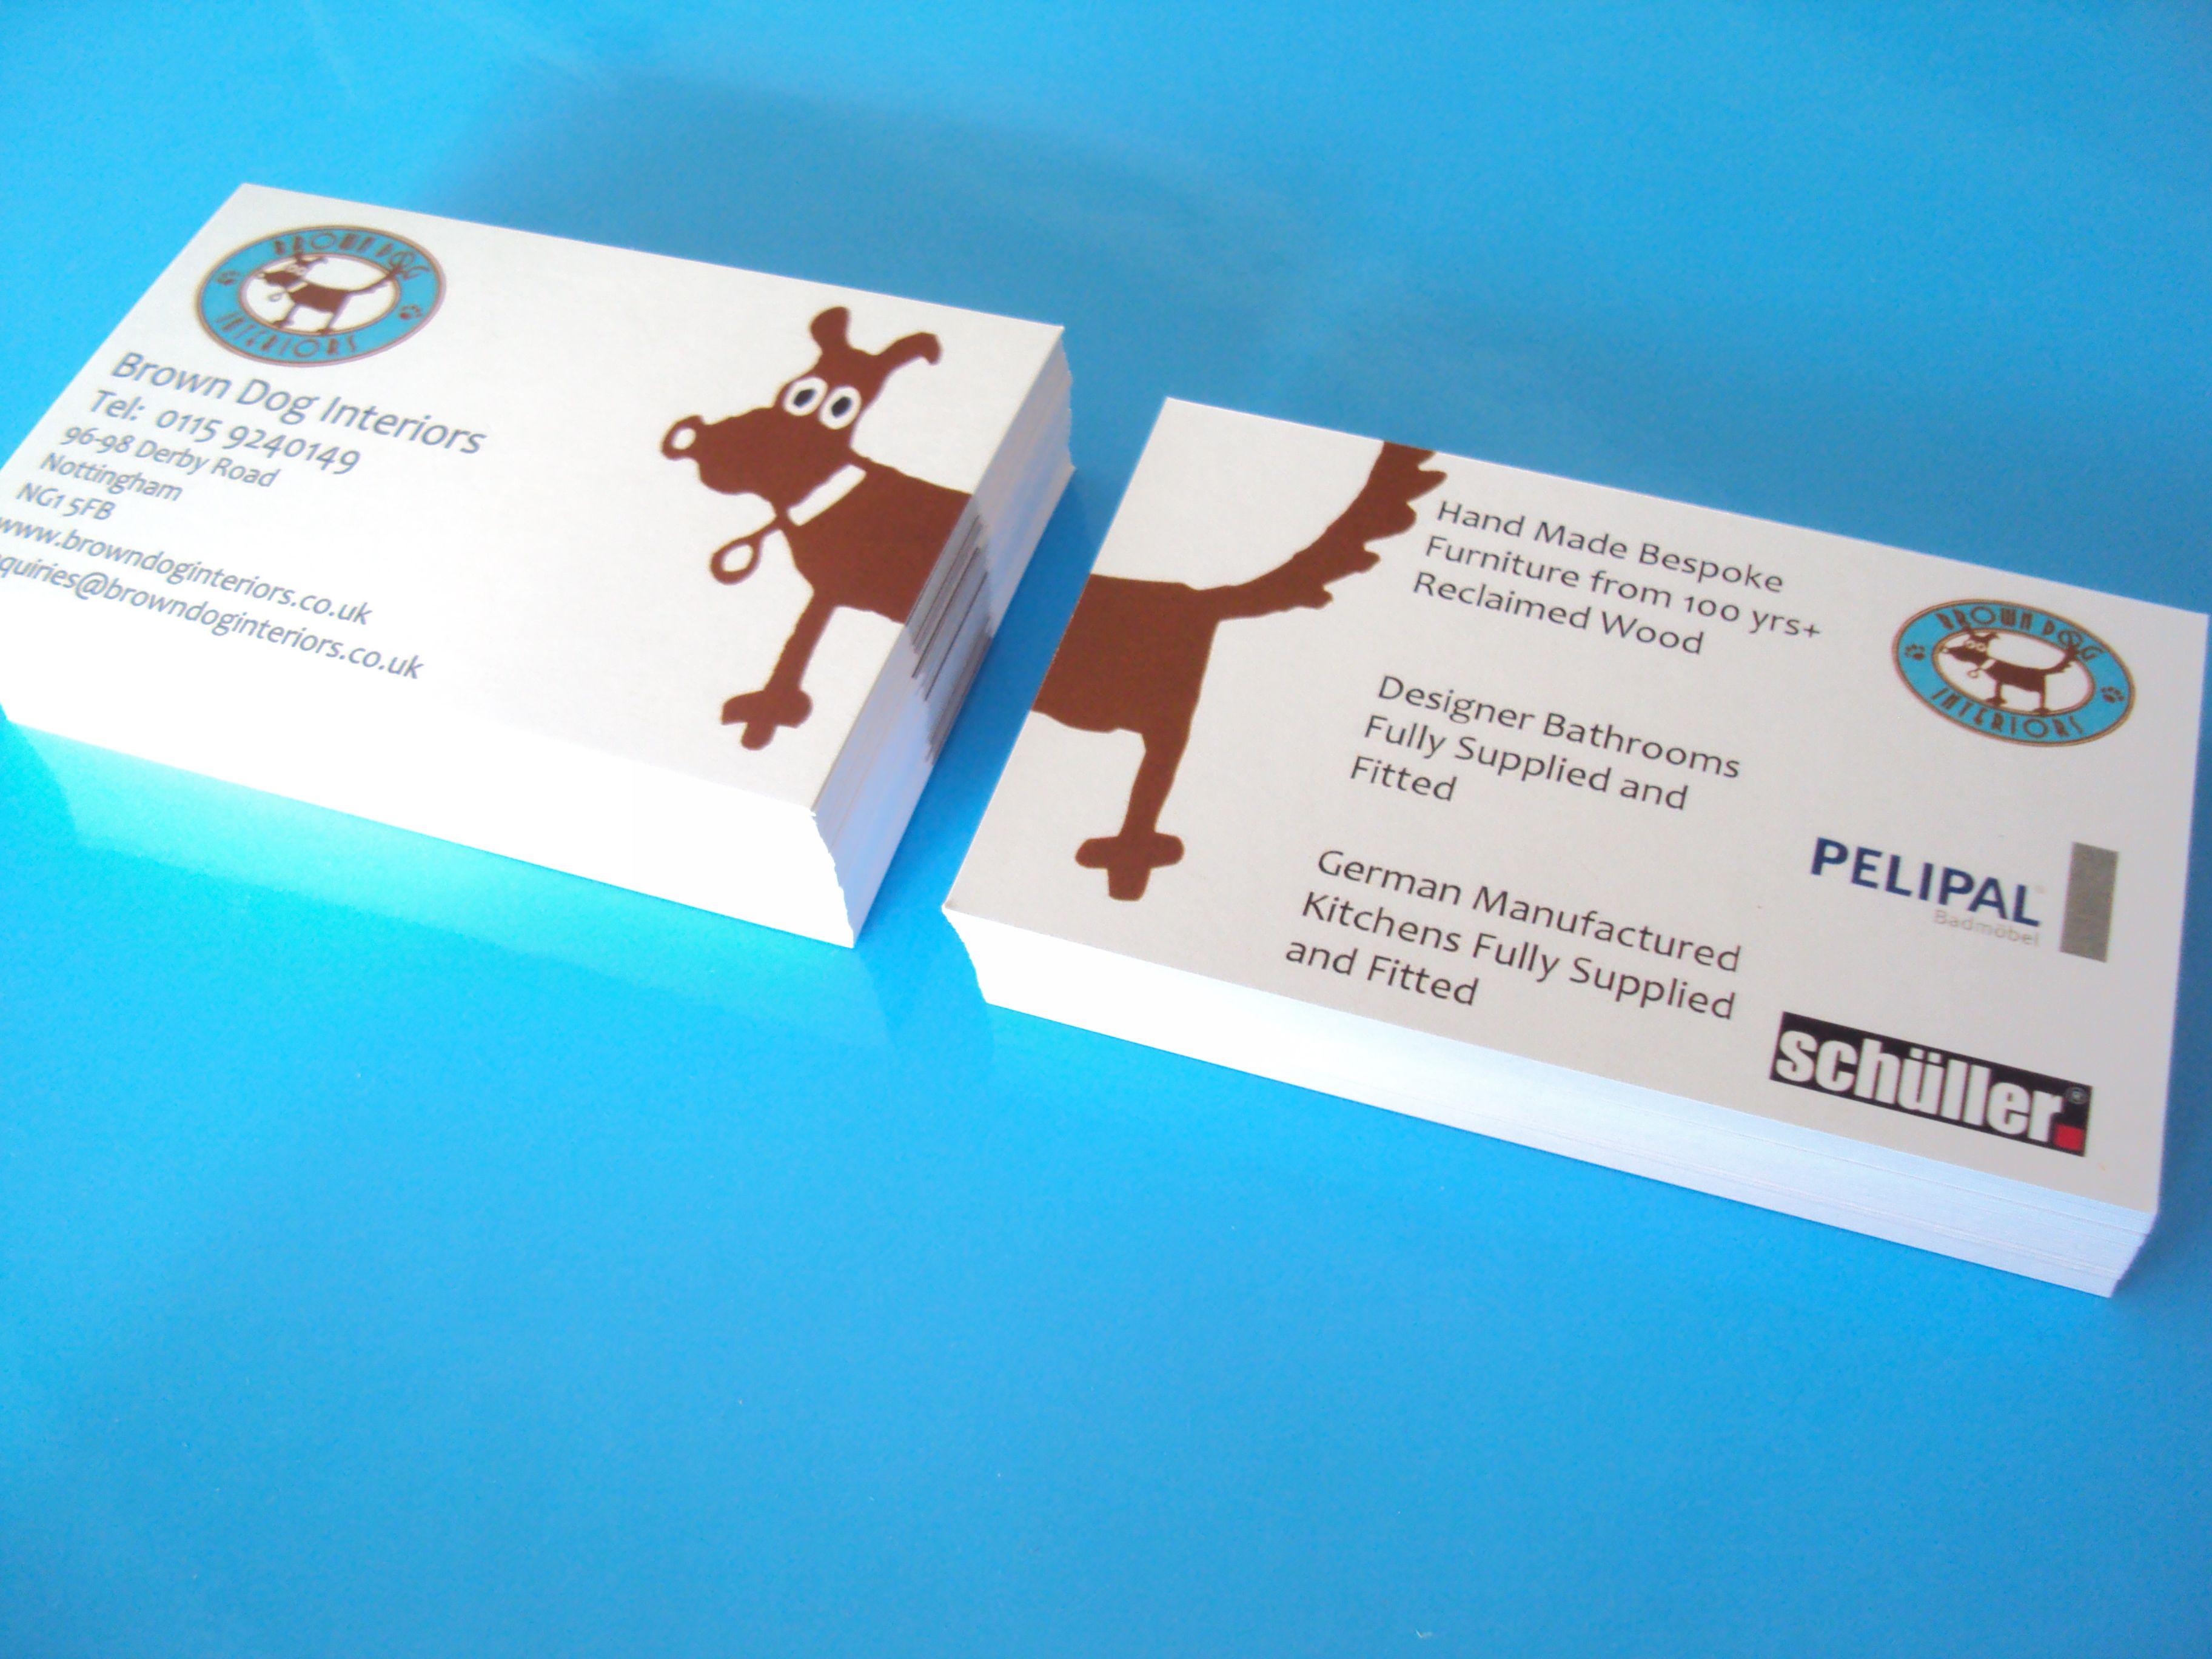 Business Cards For Brown Dog Interiors By Minuteman Press Nottingham Printed 2 Sides On 350 Gsm Matt Card Brown Dog Bespoke Furniture Design